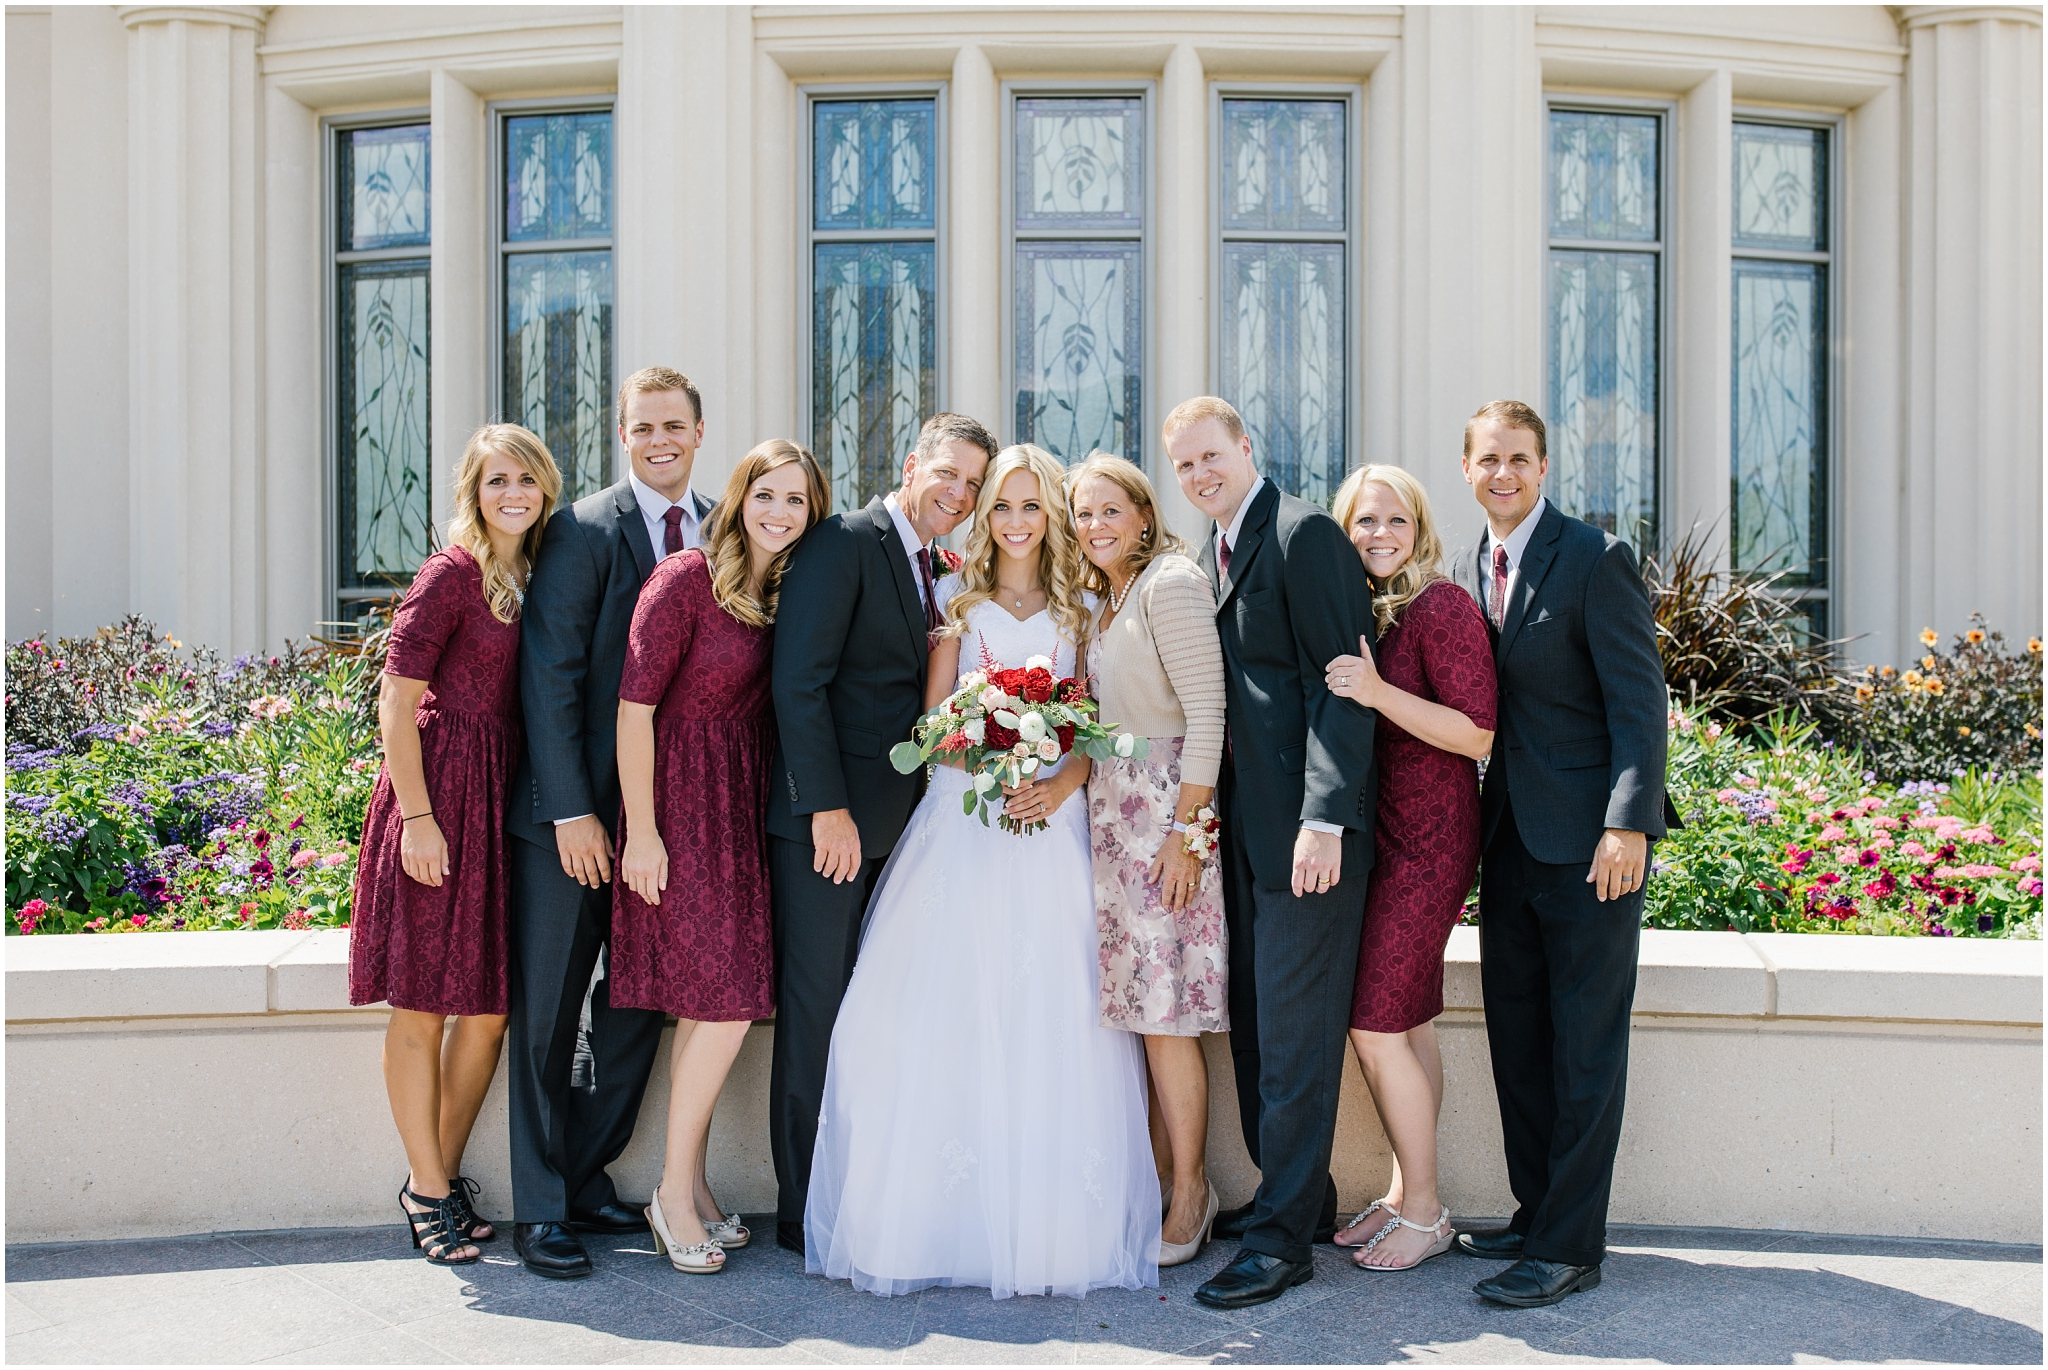 HannahChaseWedding-53_Lizzie-B-Imagery-Utah-Wedding-Photographer-Park-City-Salt-Lake-City-Payson-Temple-Clarion-Garden-Center.jpg